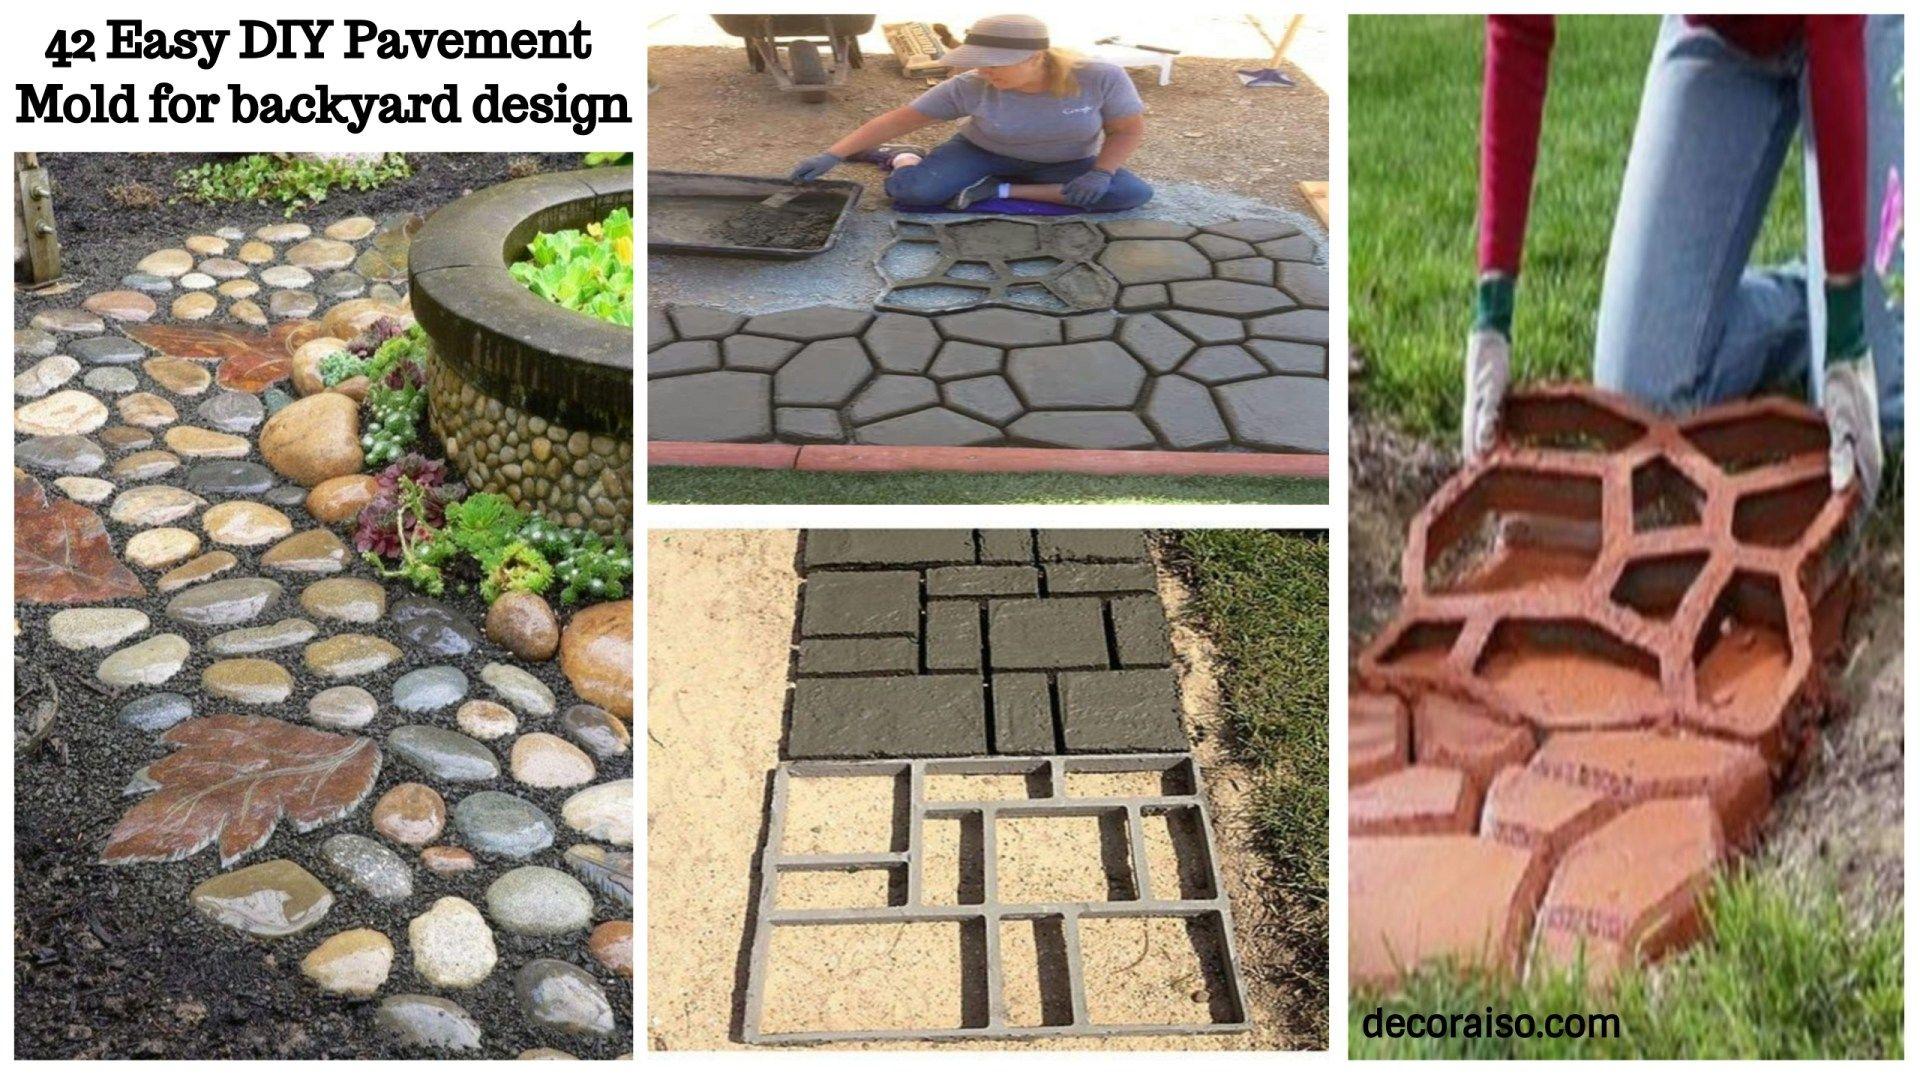 42 easy diy pavement molds for backyard design backyard